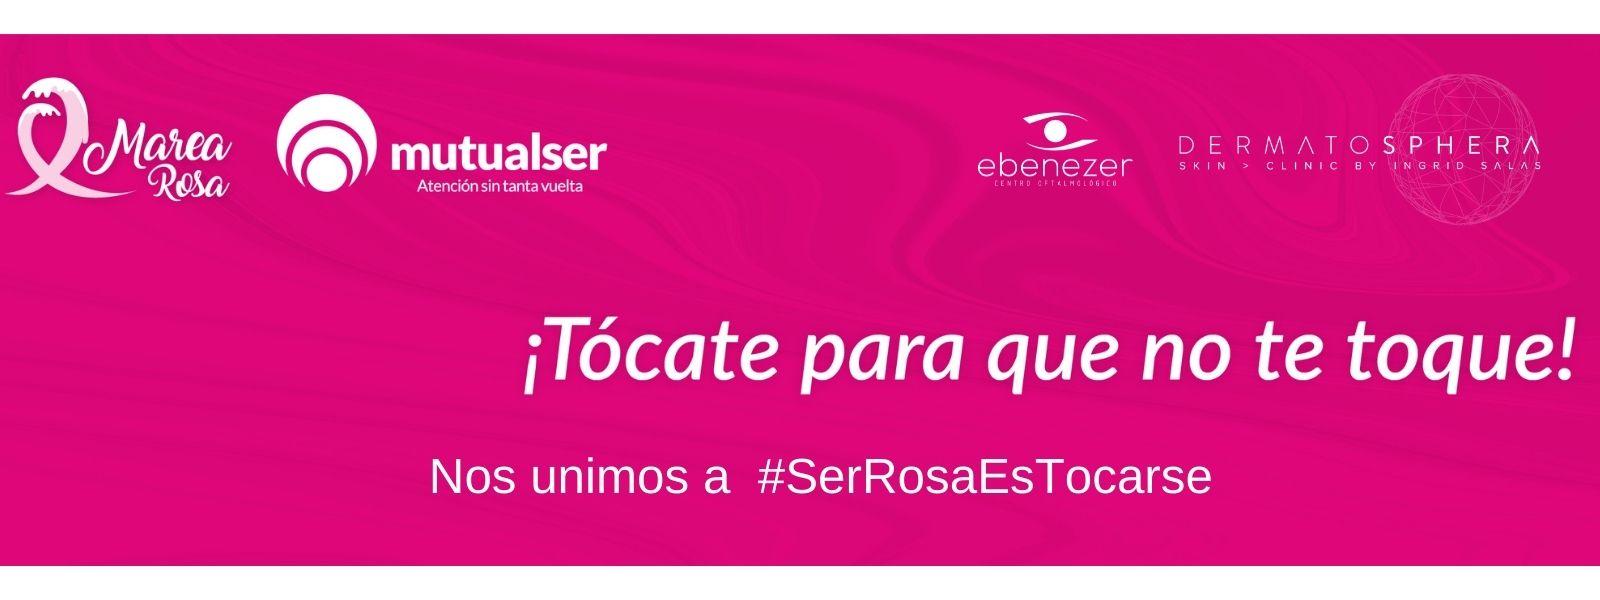 Nos unimos a #SerRosaEsTocarse